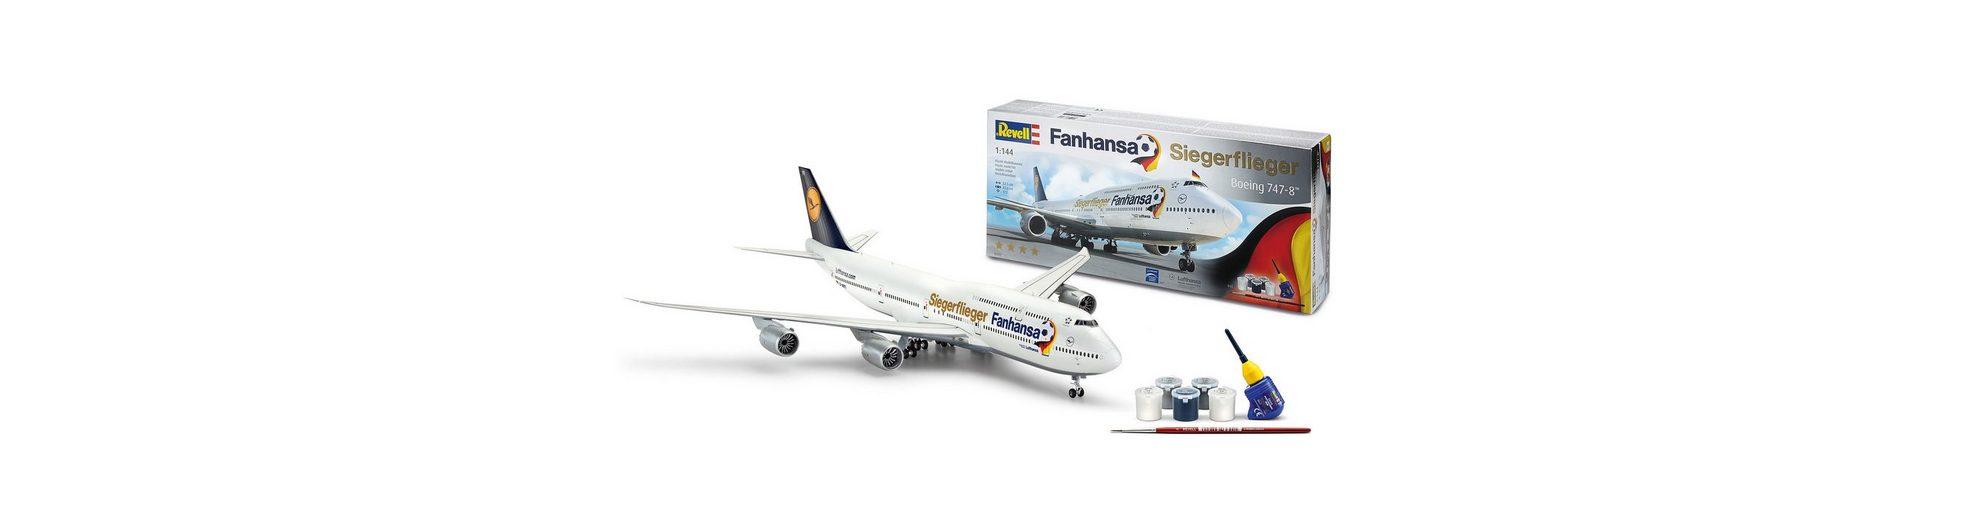 Revell® Modellbausatz Flugzeug, »Boeing 747-8 Fanhansa Siegerflieger«, Maßstab 1:144